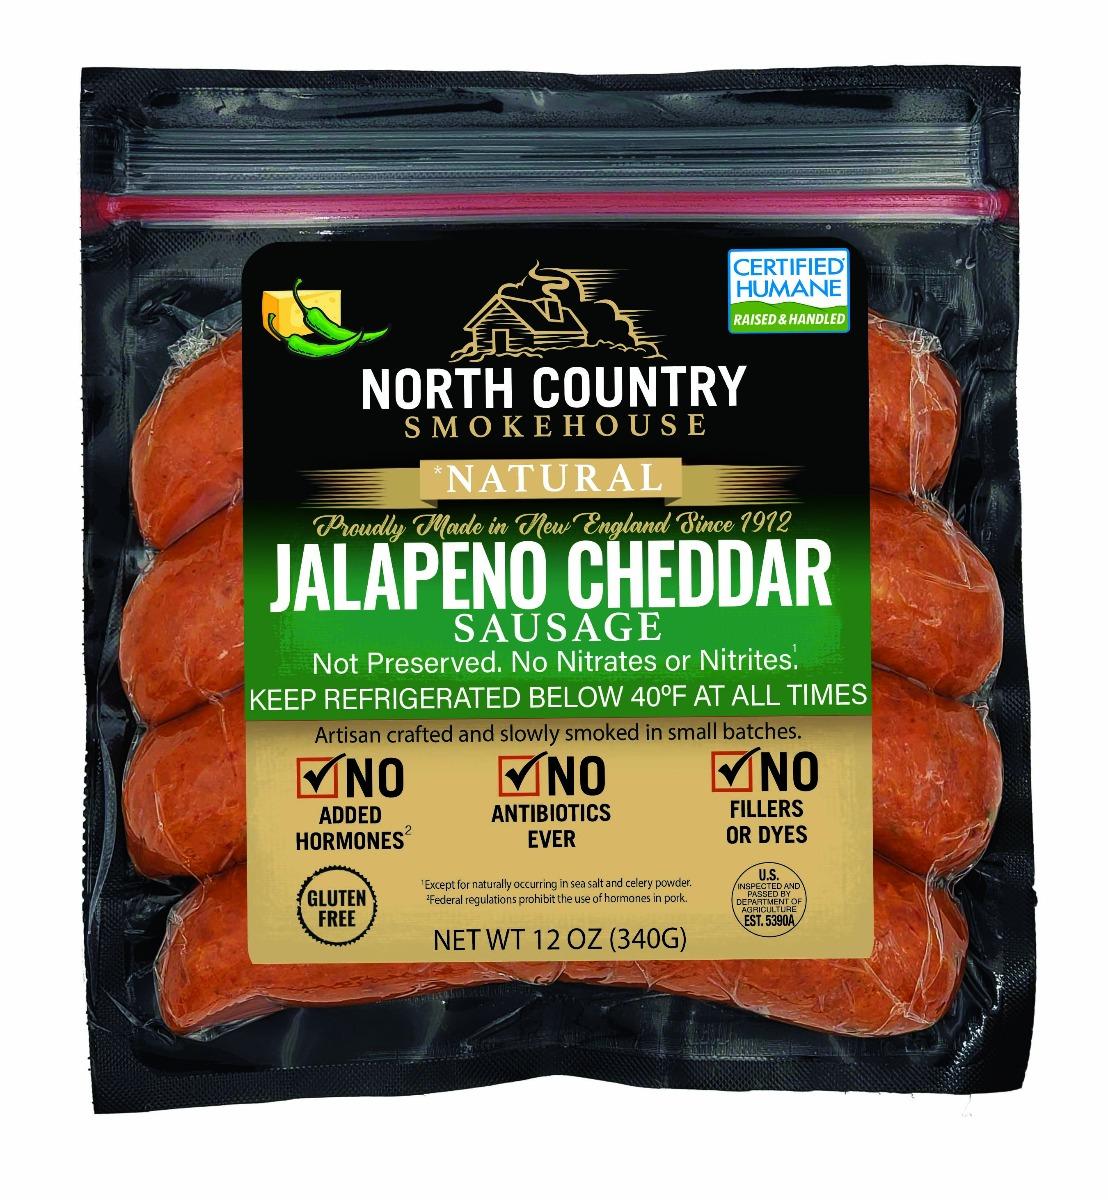 Natural Jalapeno Cheddar Sausage - 3, 12 oz. packages